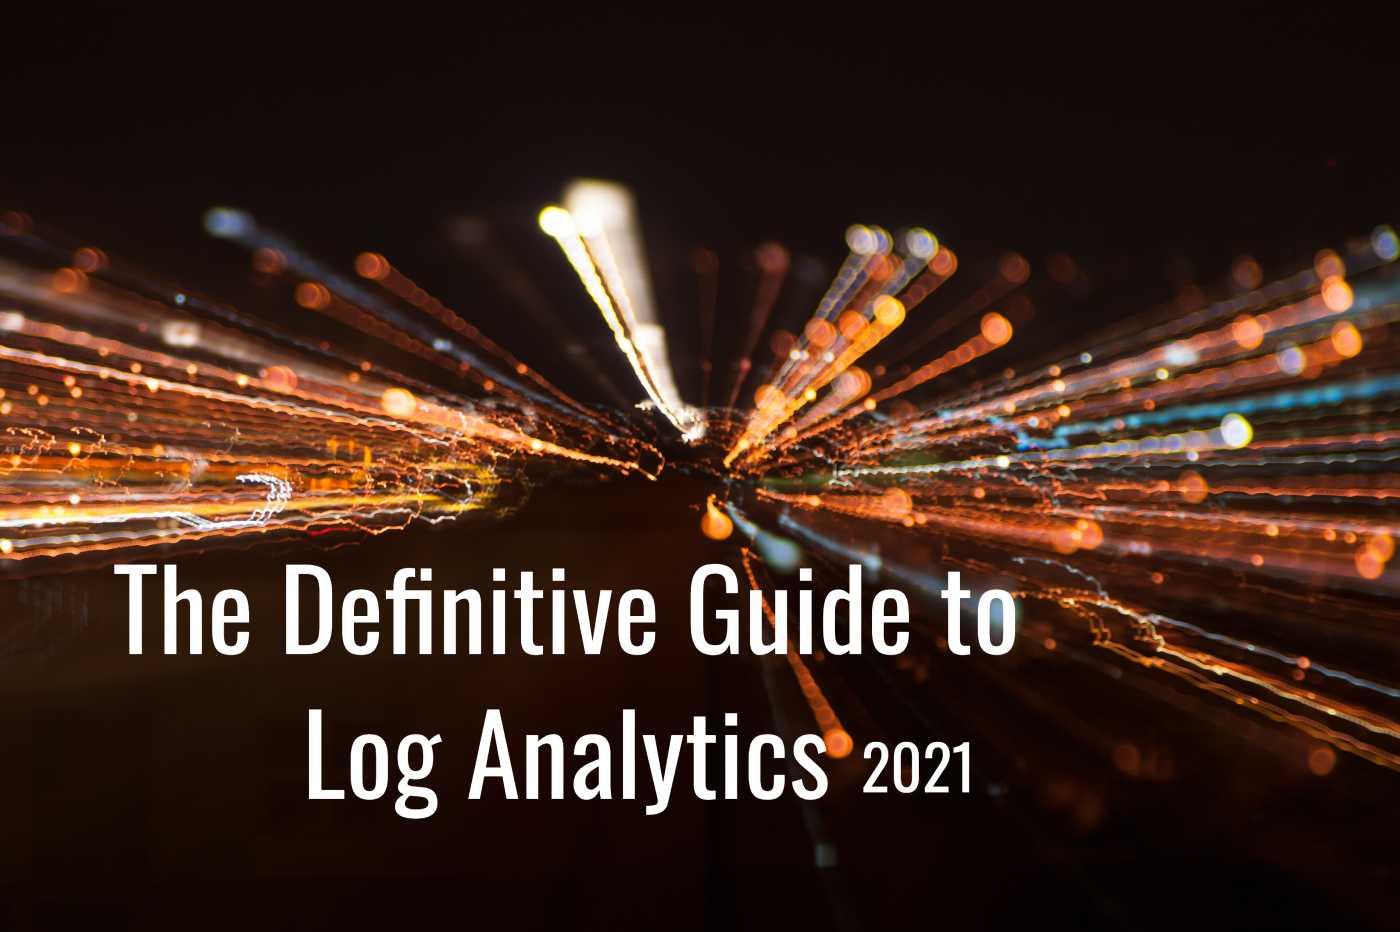 Log Analytics 2021 Guide